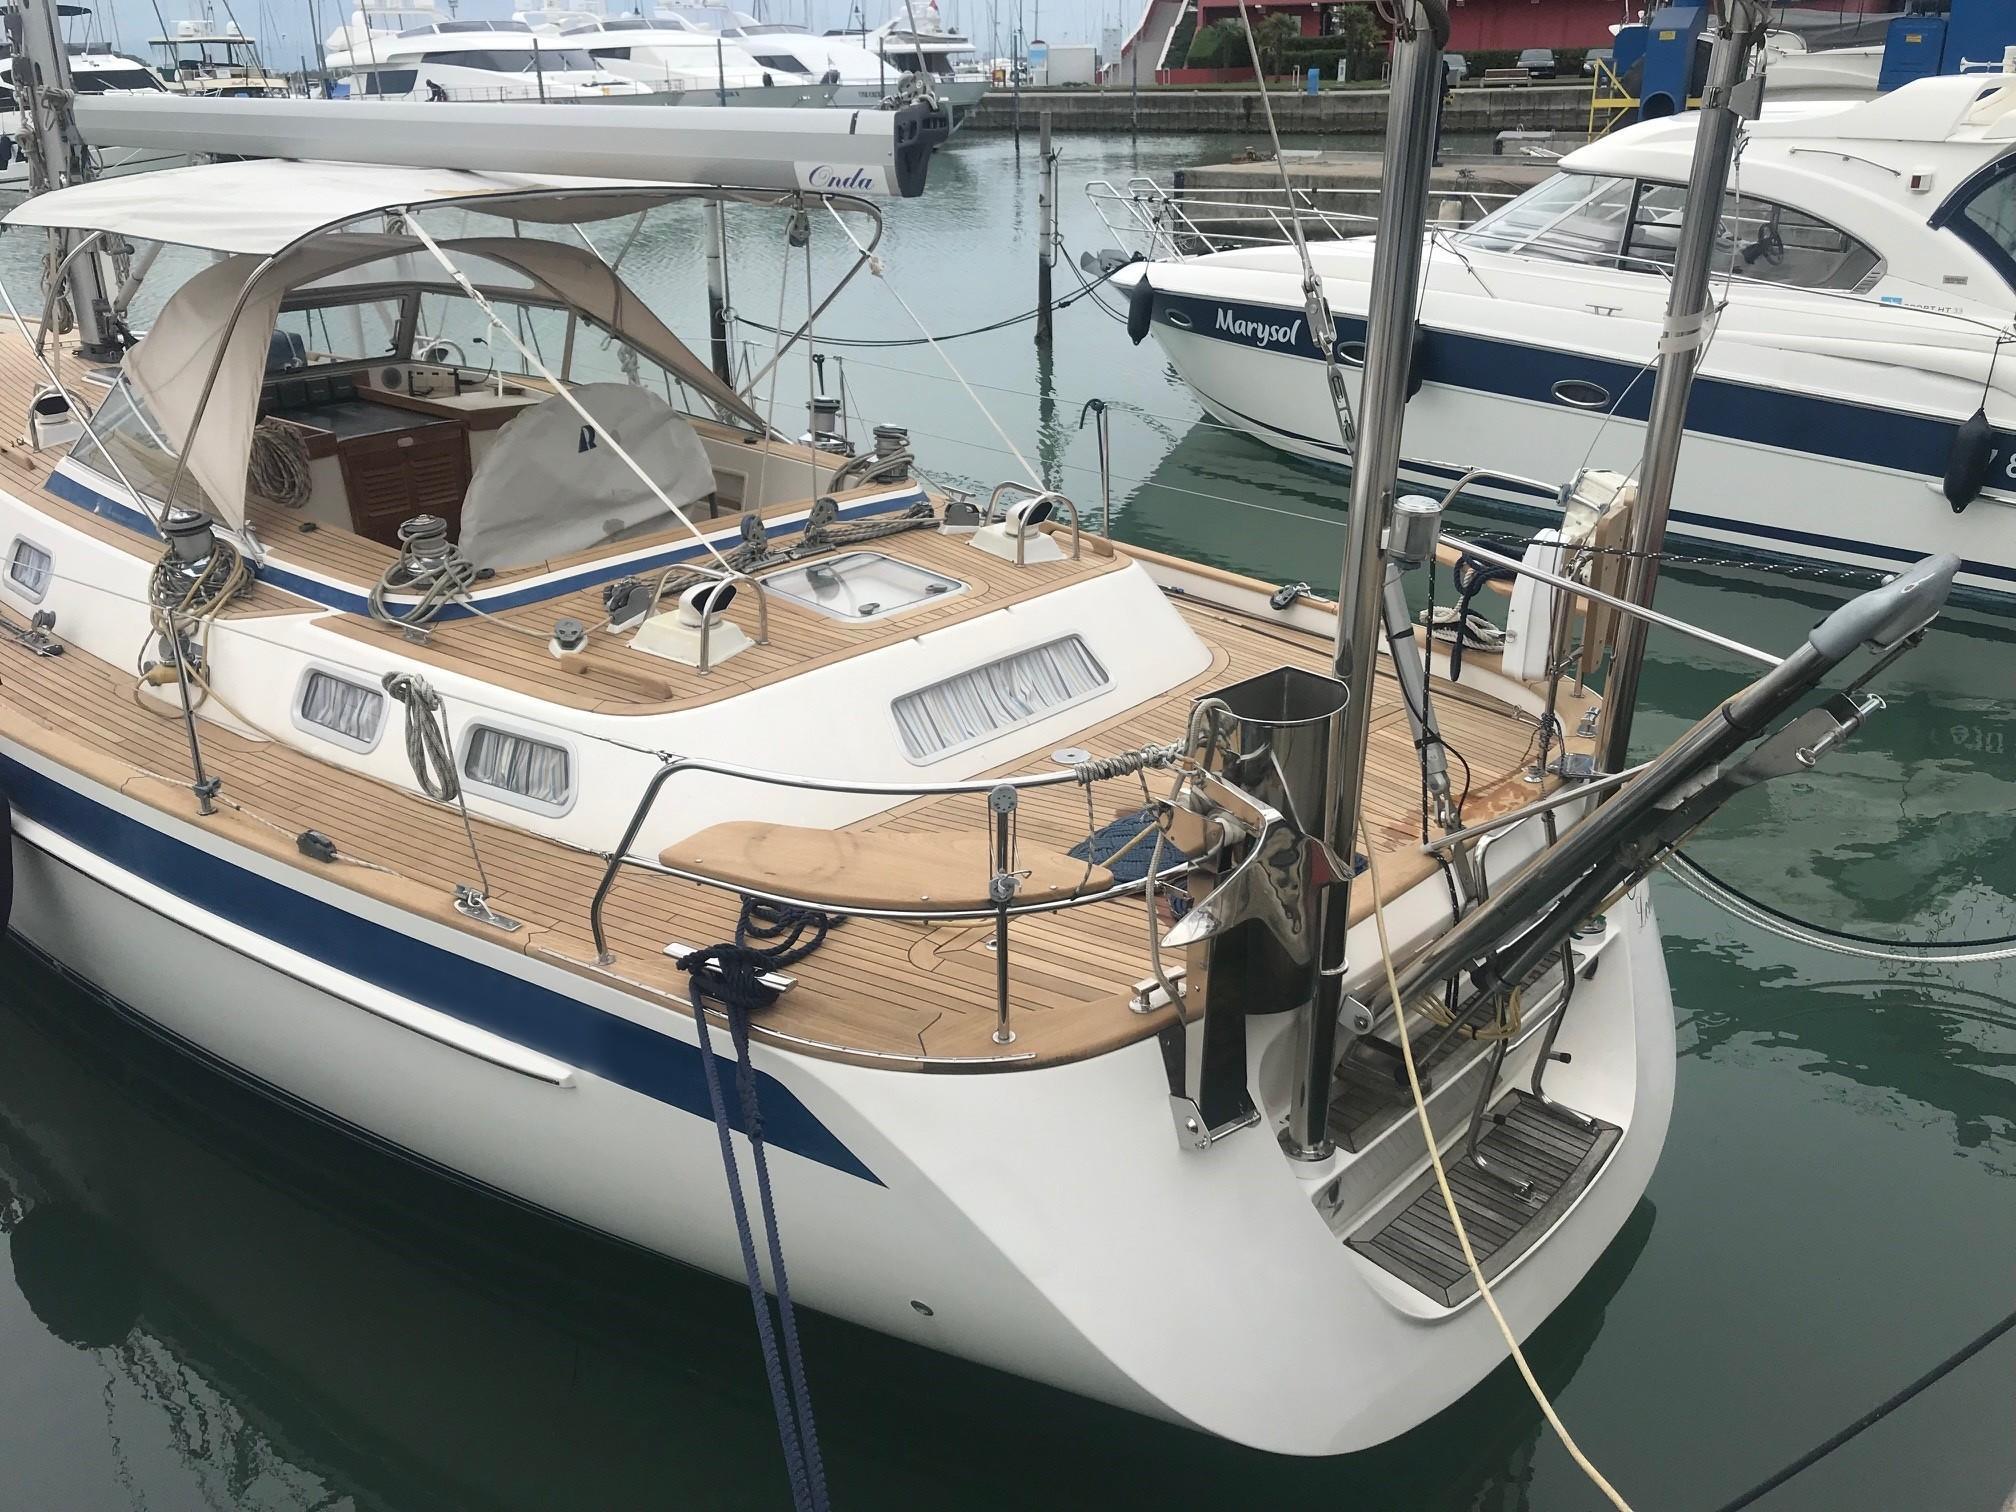 49 Hallberg-Rassy 4338 2007 Alto Adriatico | Denison Yacht Sales